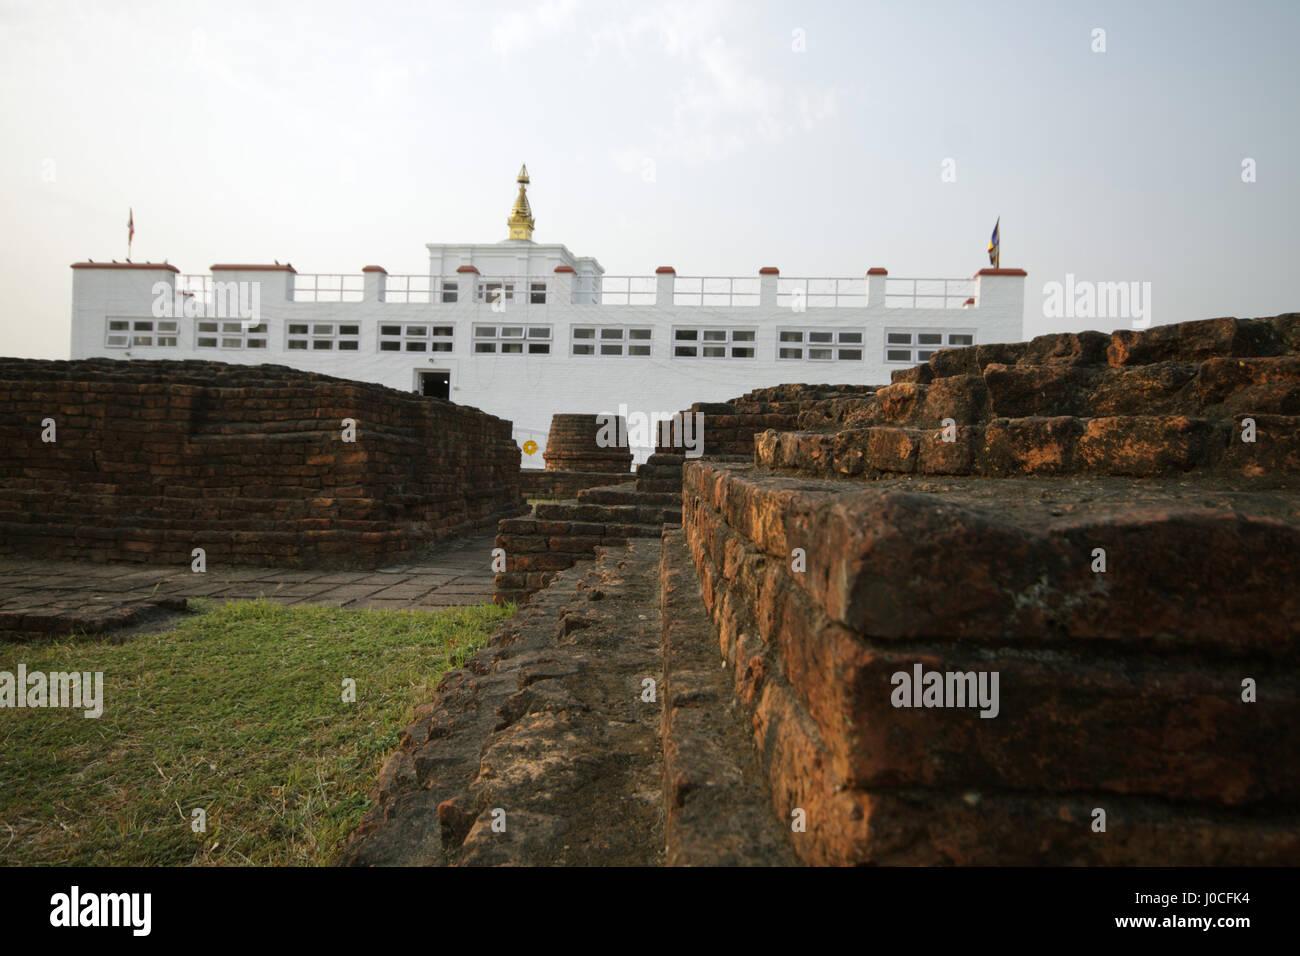 Maya devi temple, lumbini, nepal - Stock Image